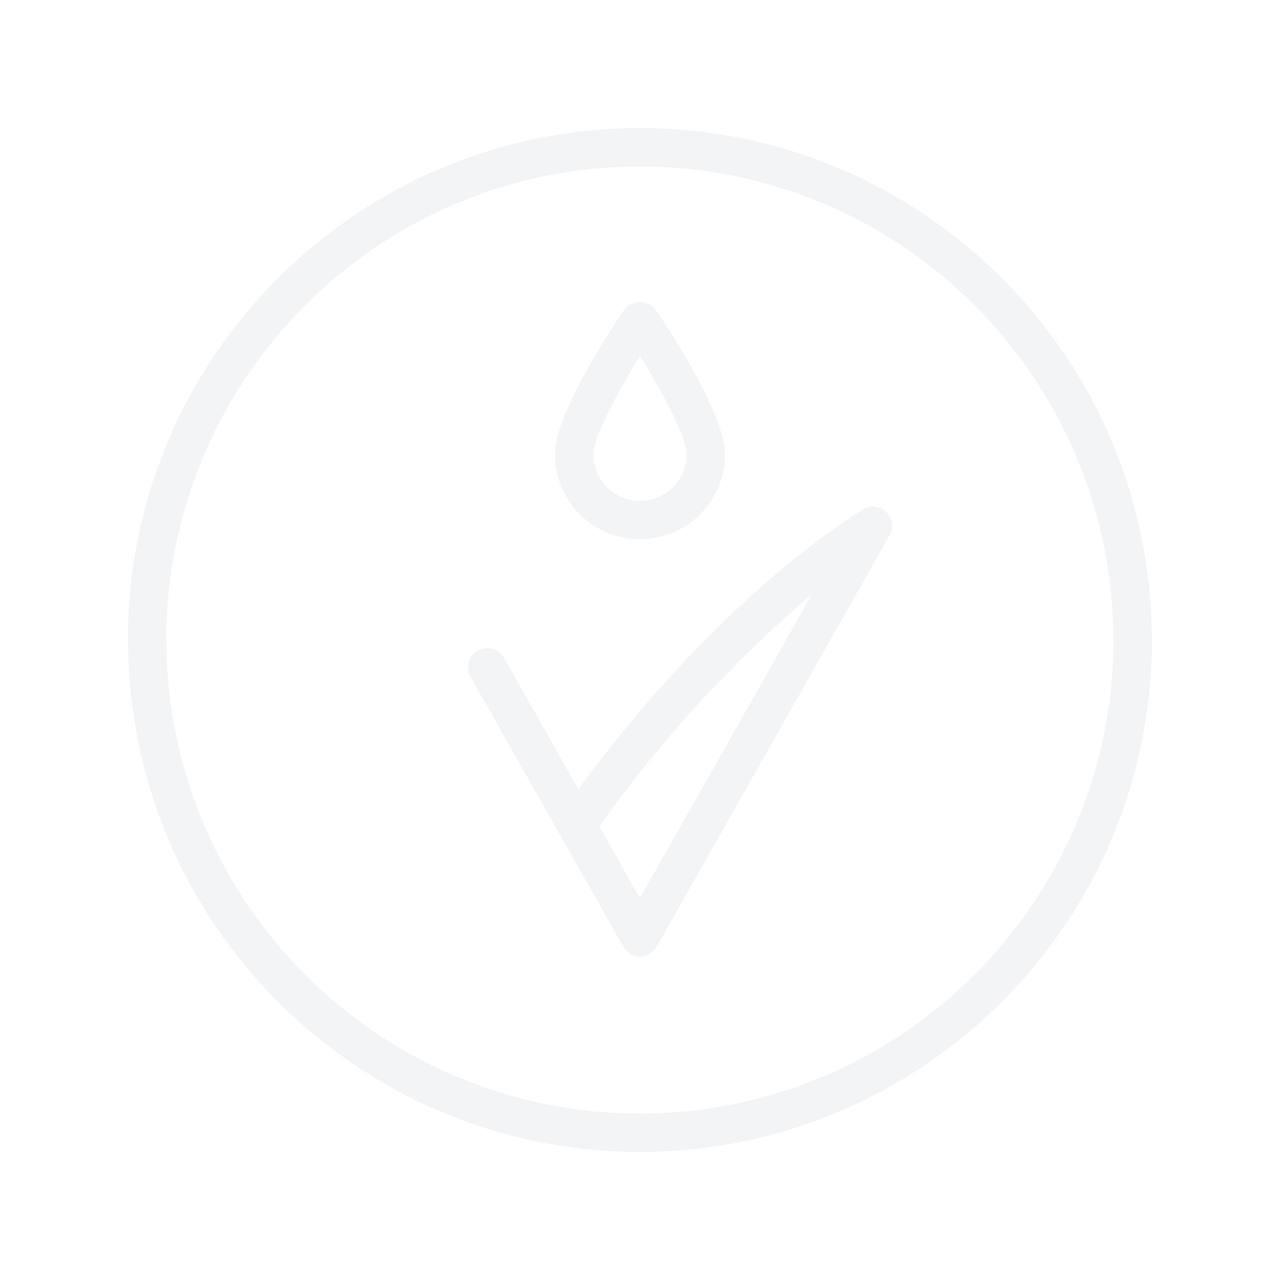 Dolce & Gabbana Anthology No. 3 L'Imperatrice EDT 100ml